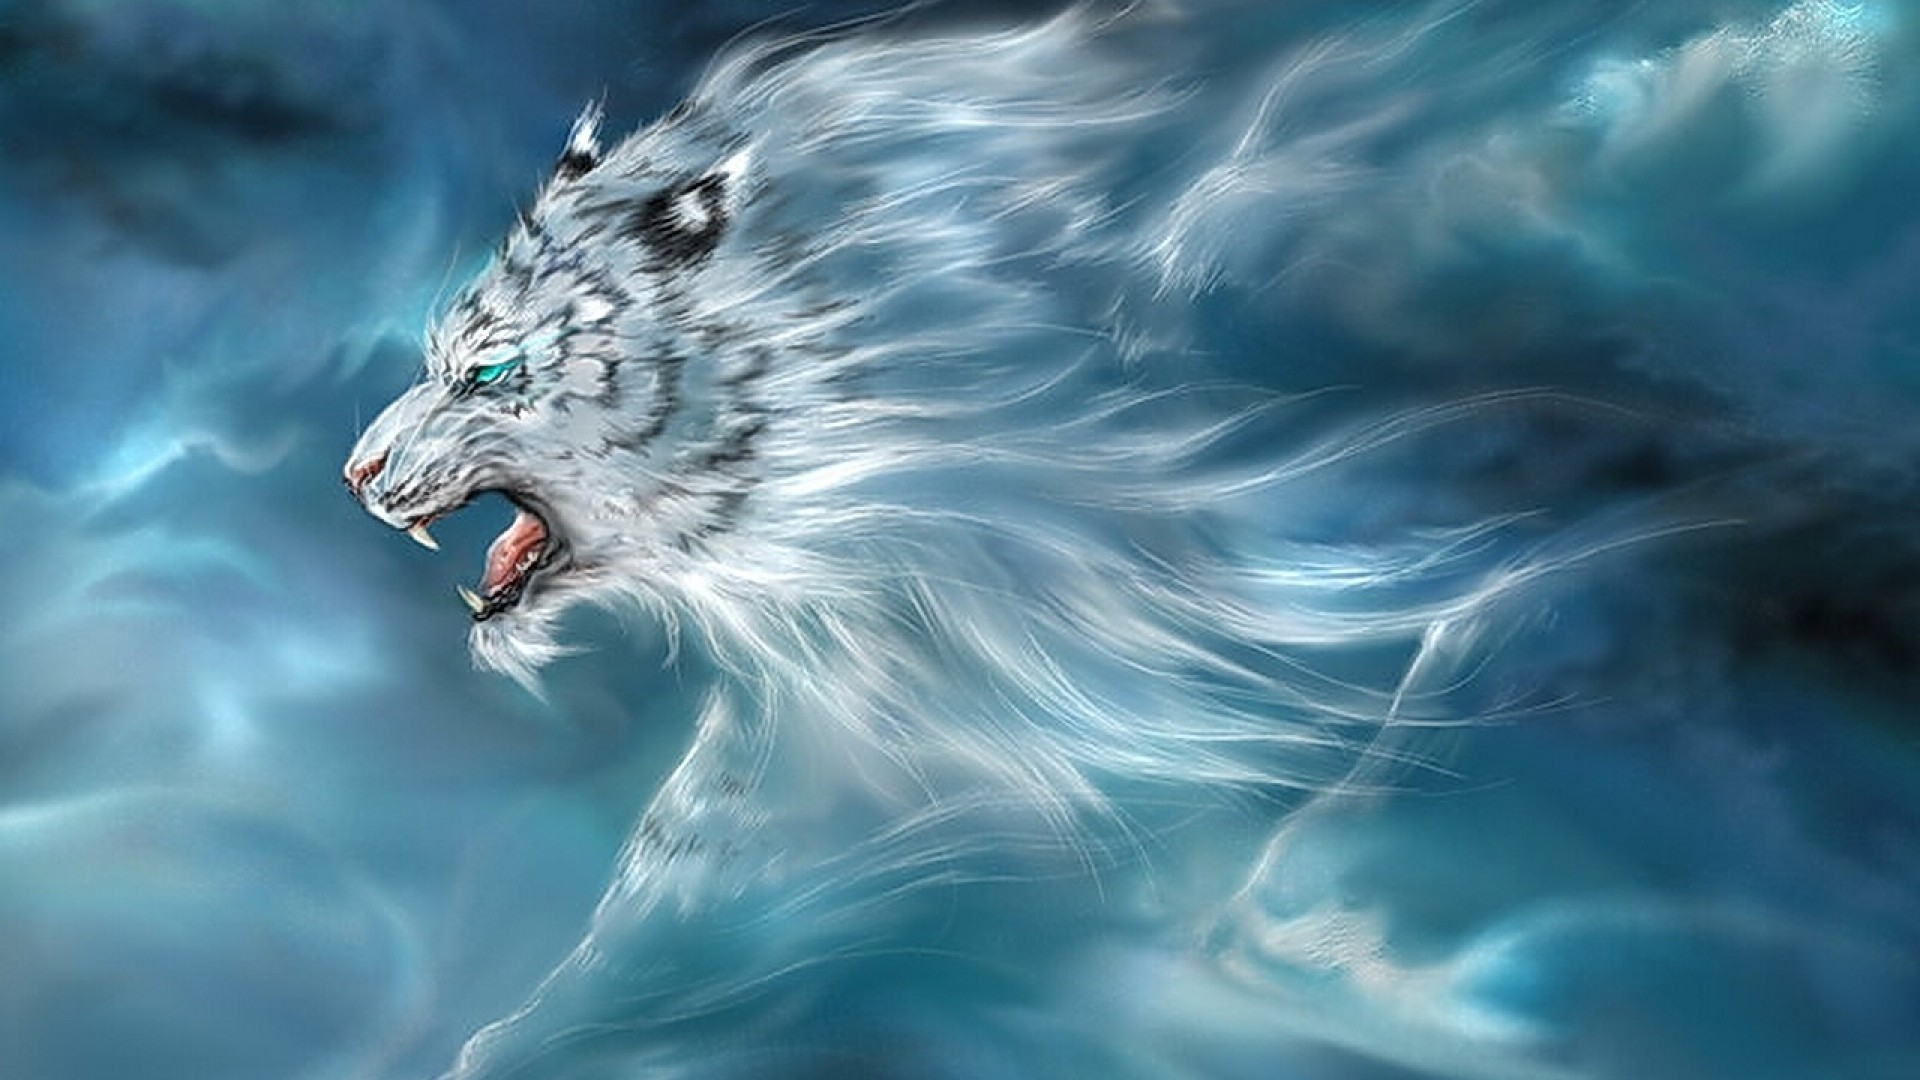 … Background Full HD 1080p. Wallpaper tiger, sky, being, flight